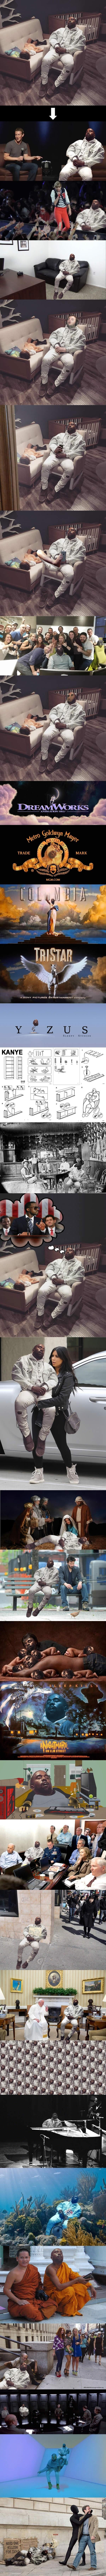 Kanye caught snoozing